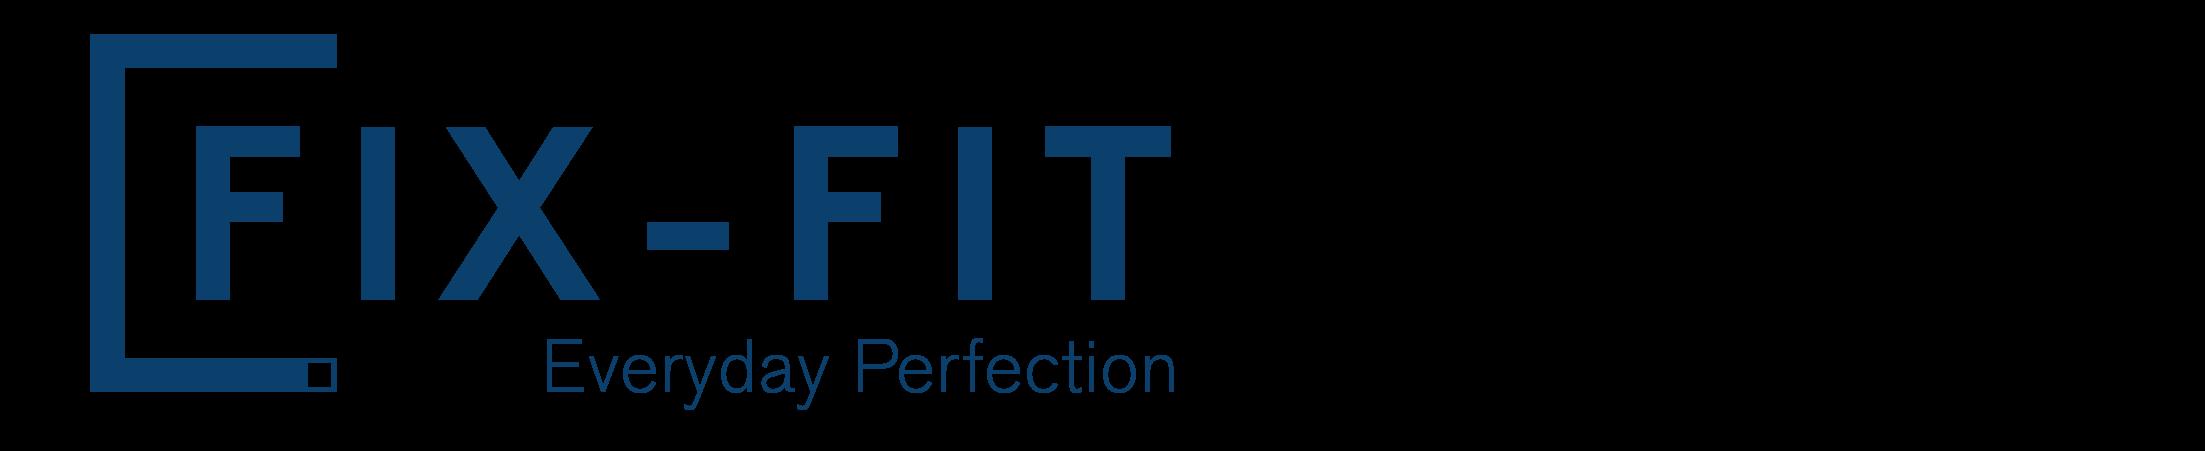 Fix-Fit